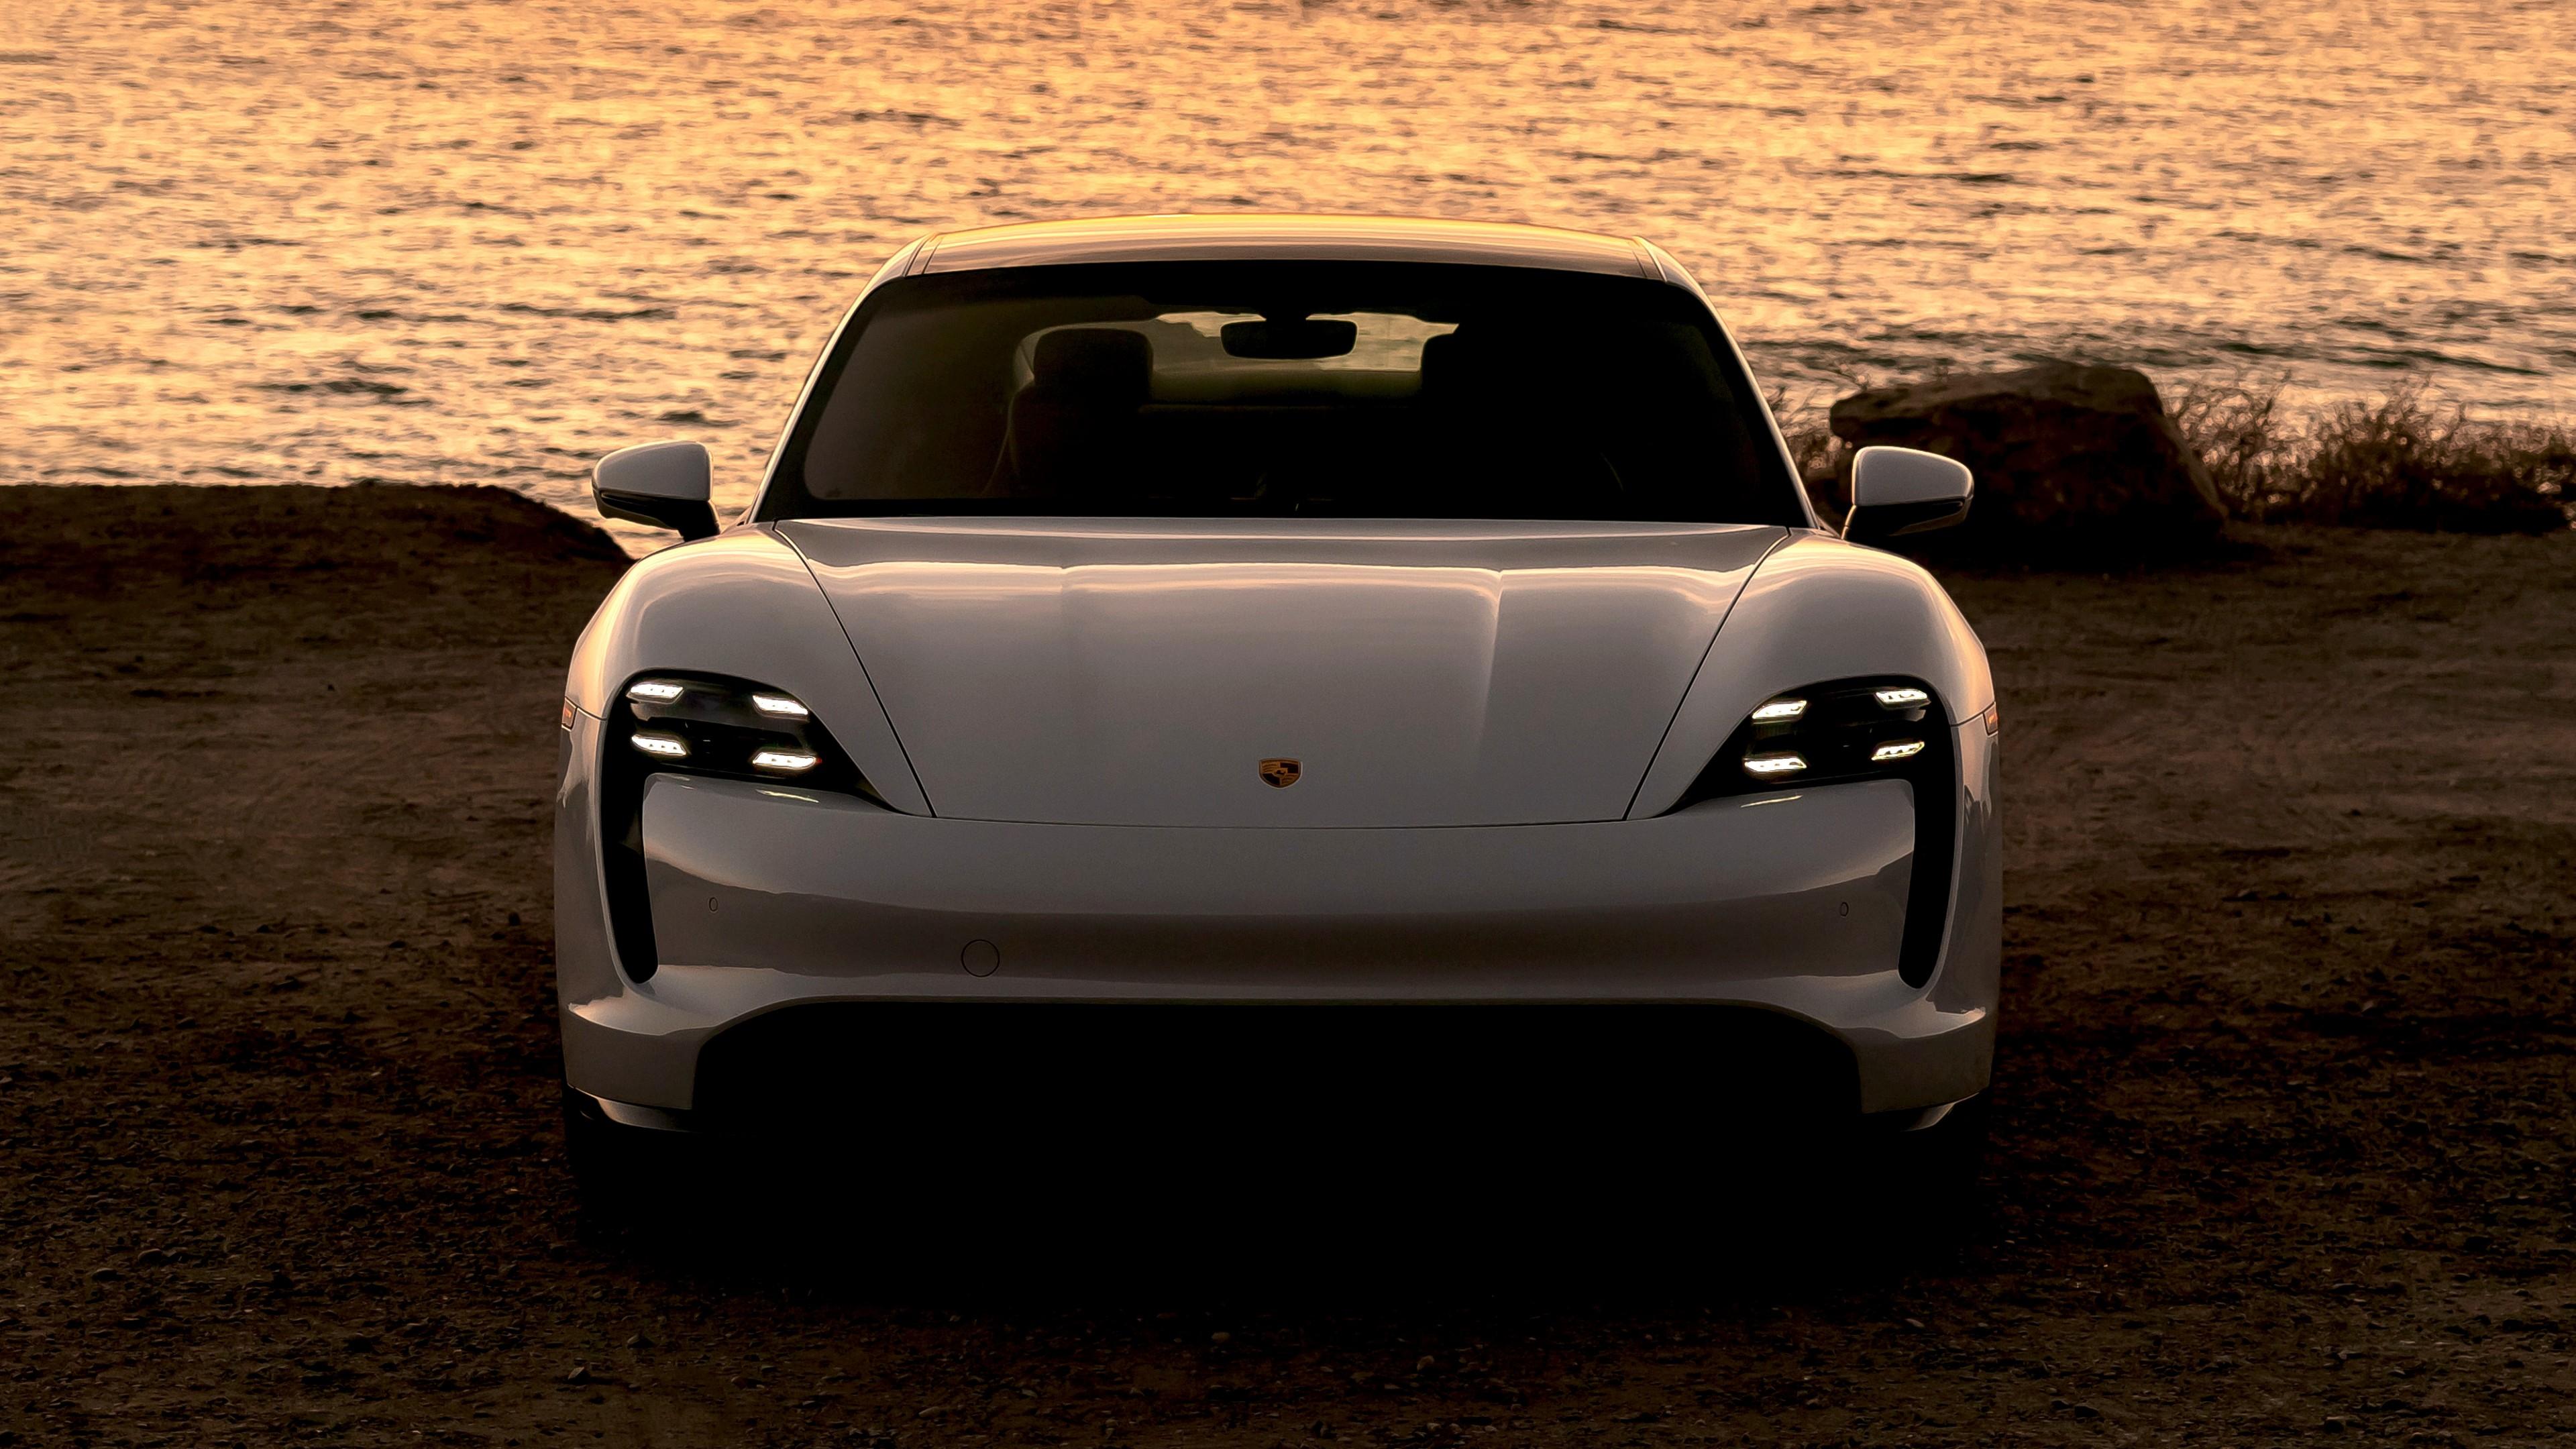 2020 Porsche Taycan Turbo S 4k Wallpaper Hd Car Wallpapers Id 13784